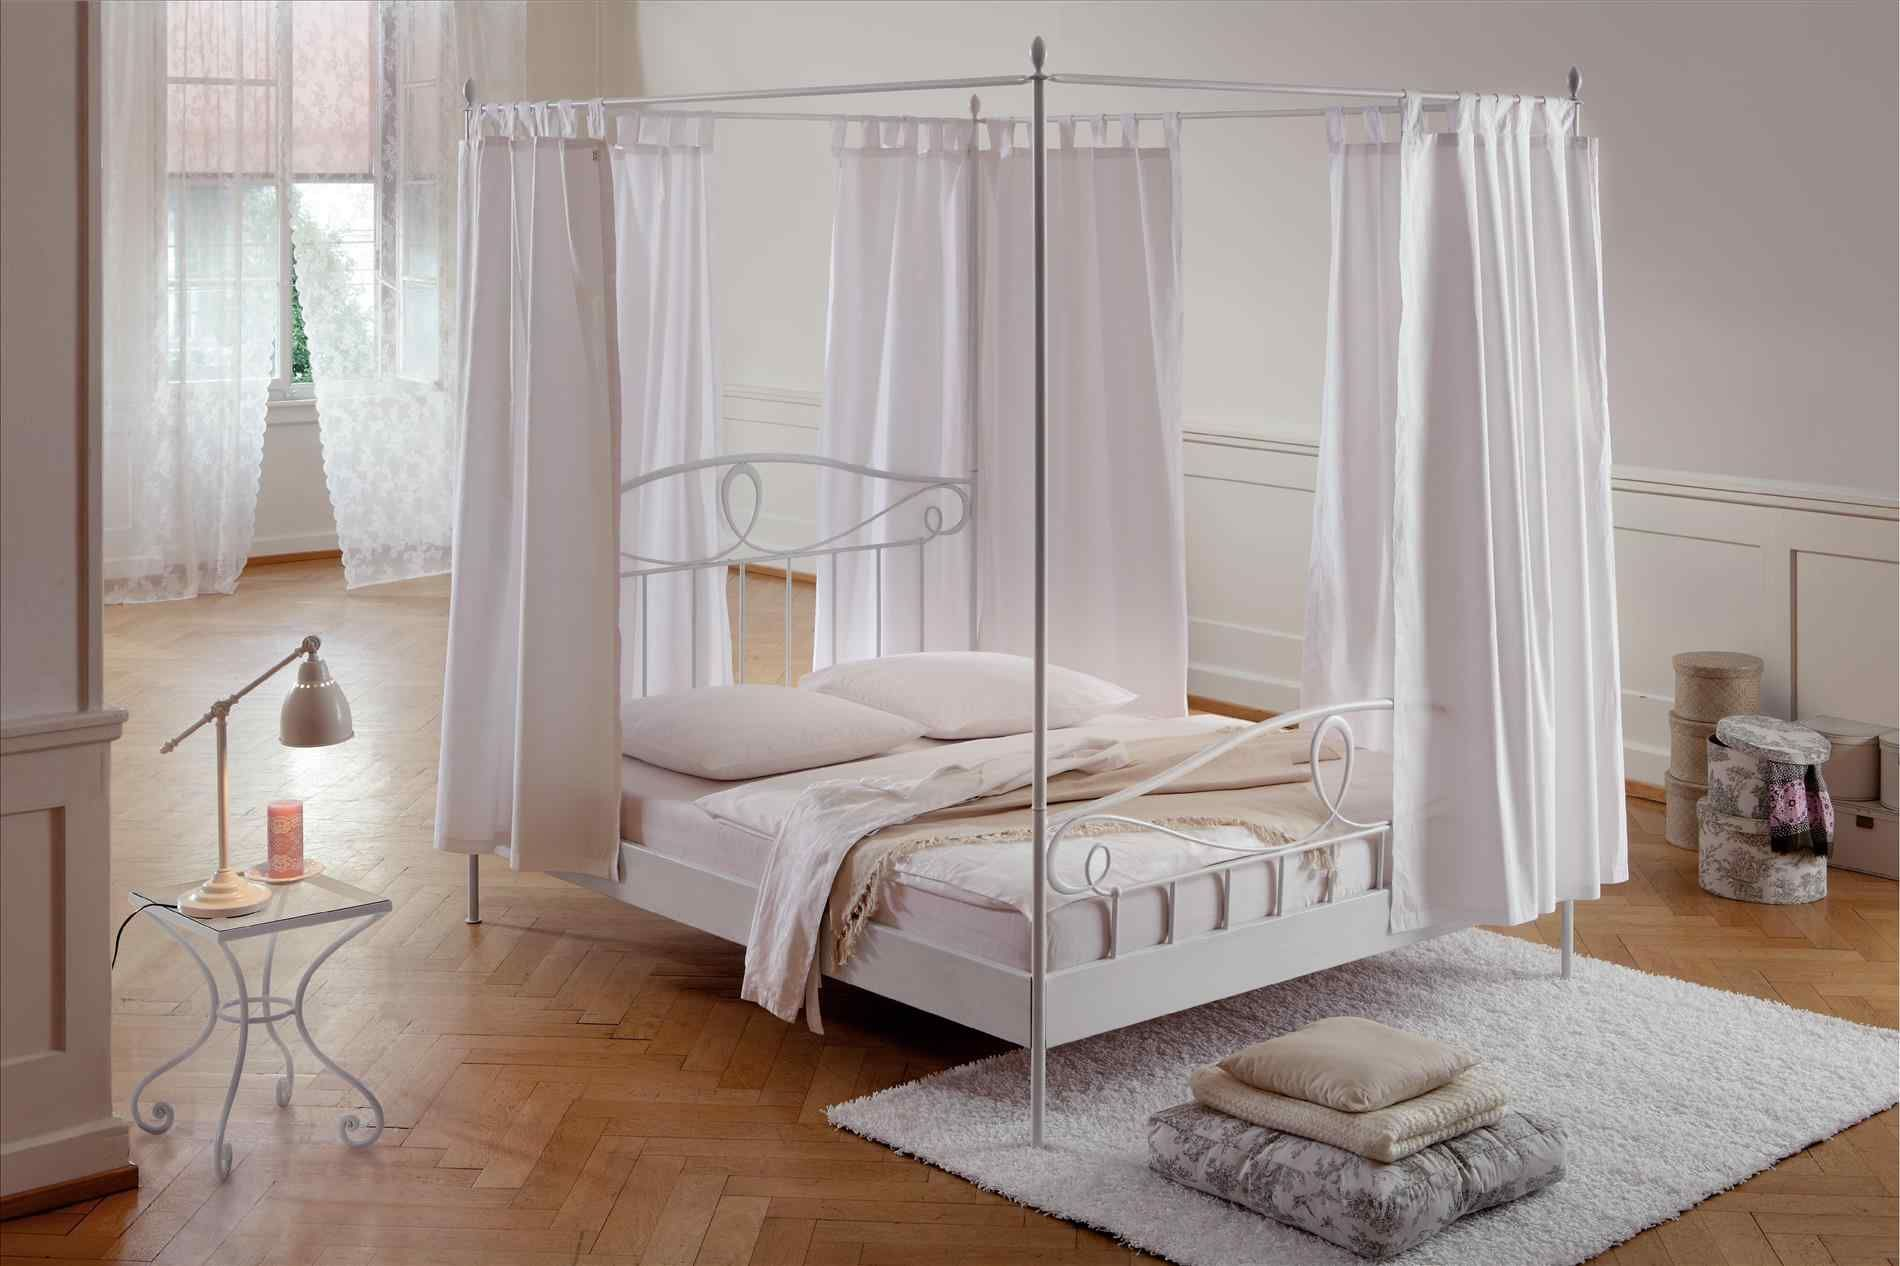 Pin de Sherry J. Williams en romantic master bedroom with canopy bed ...